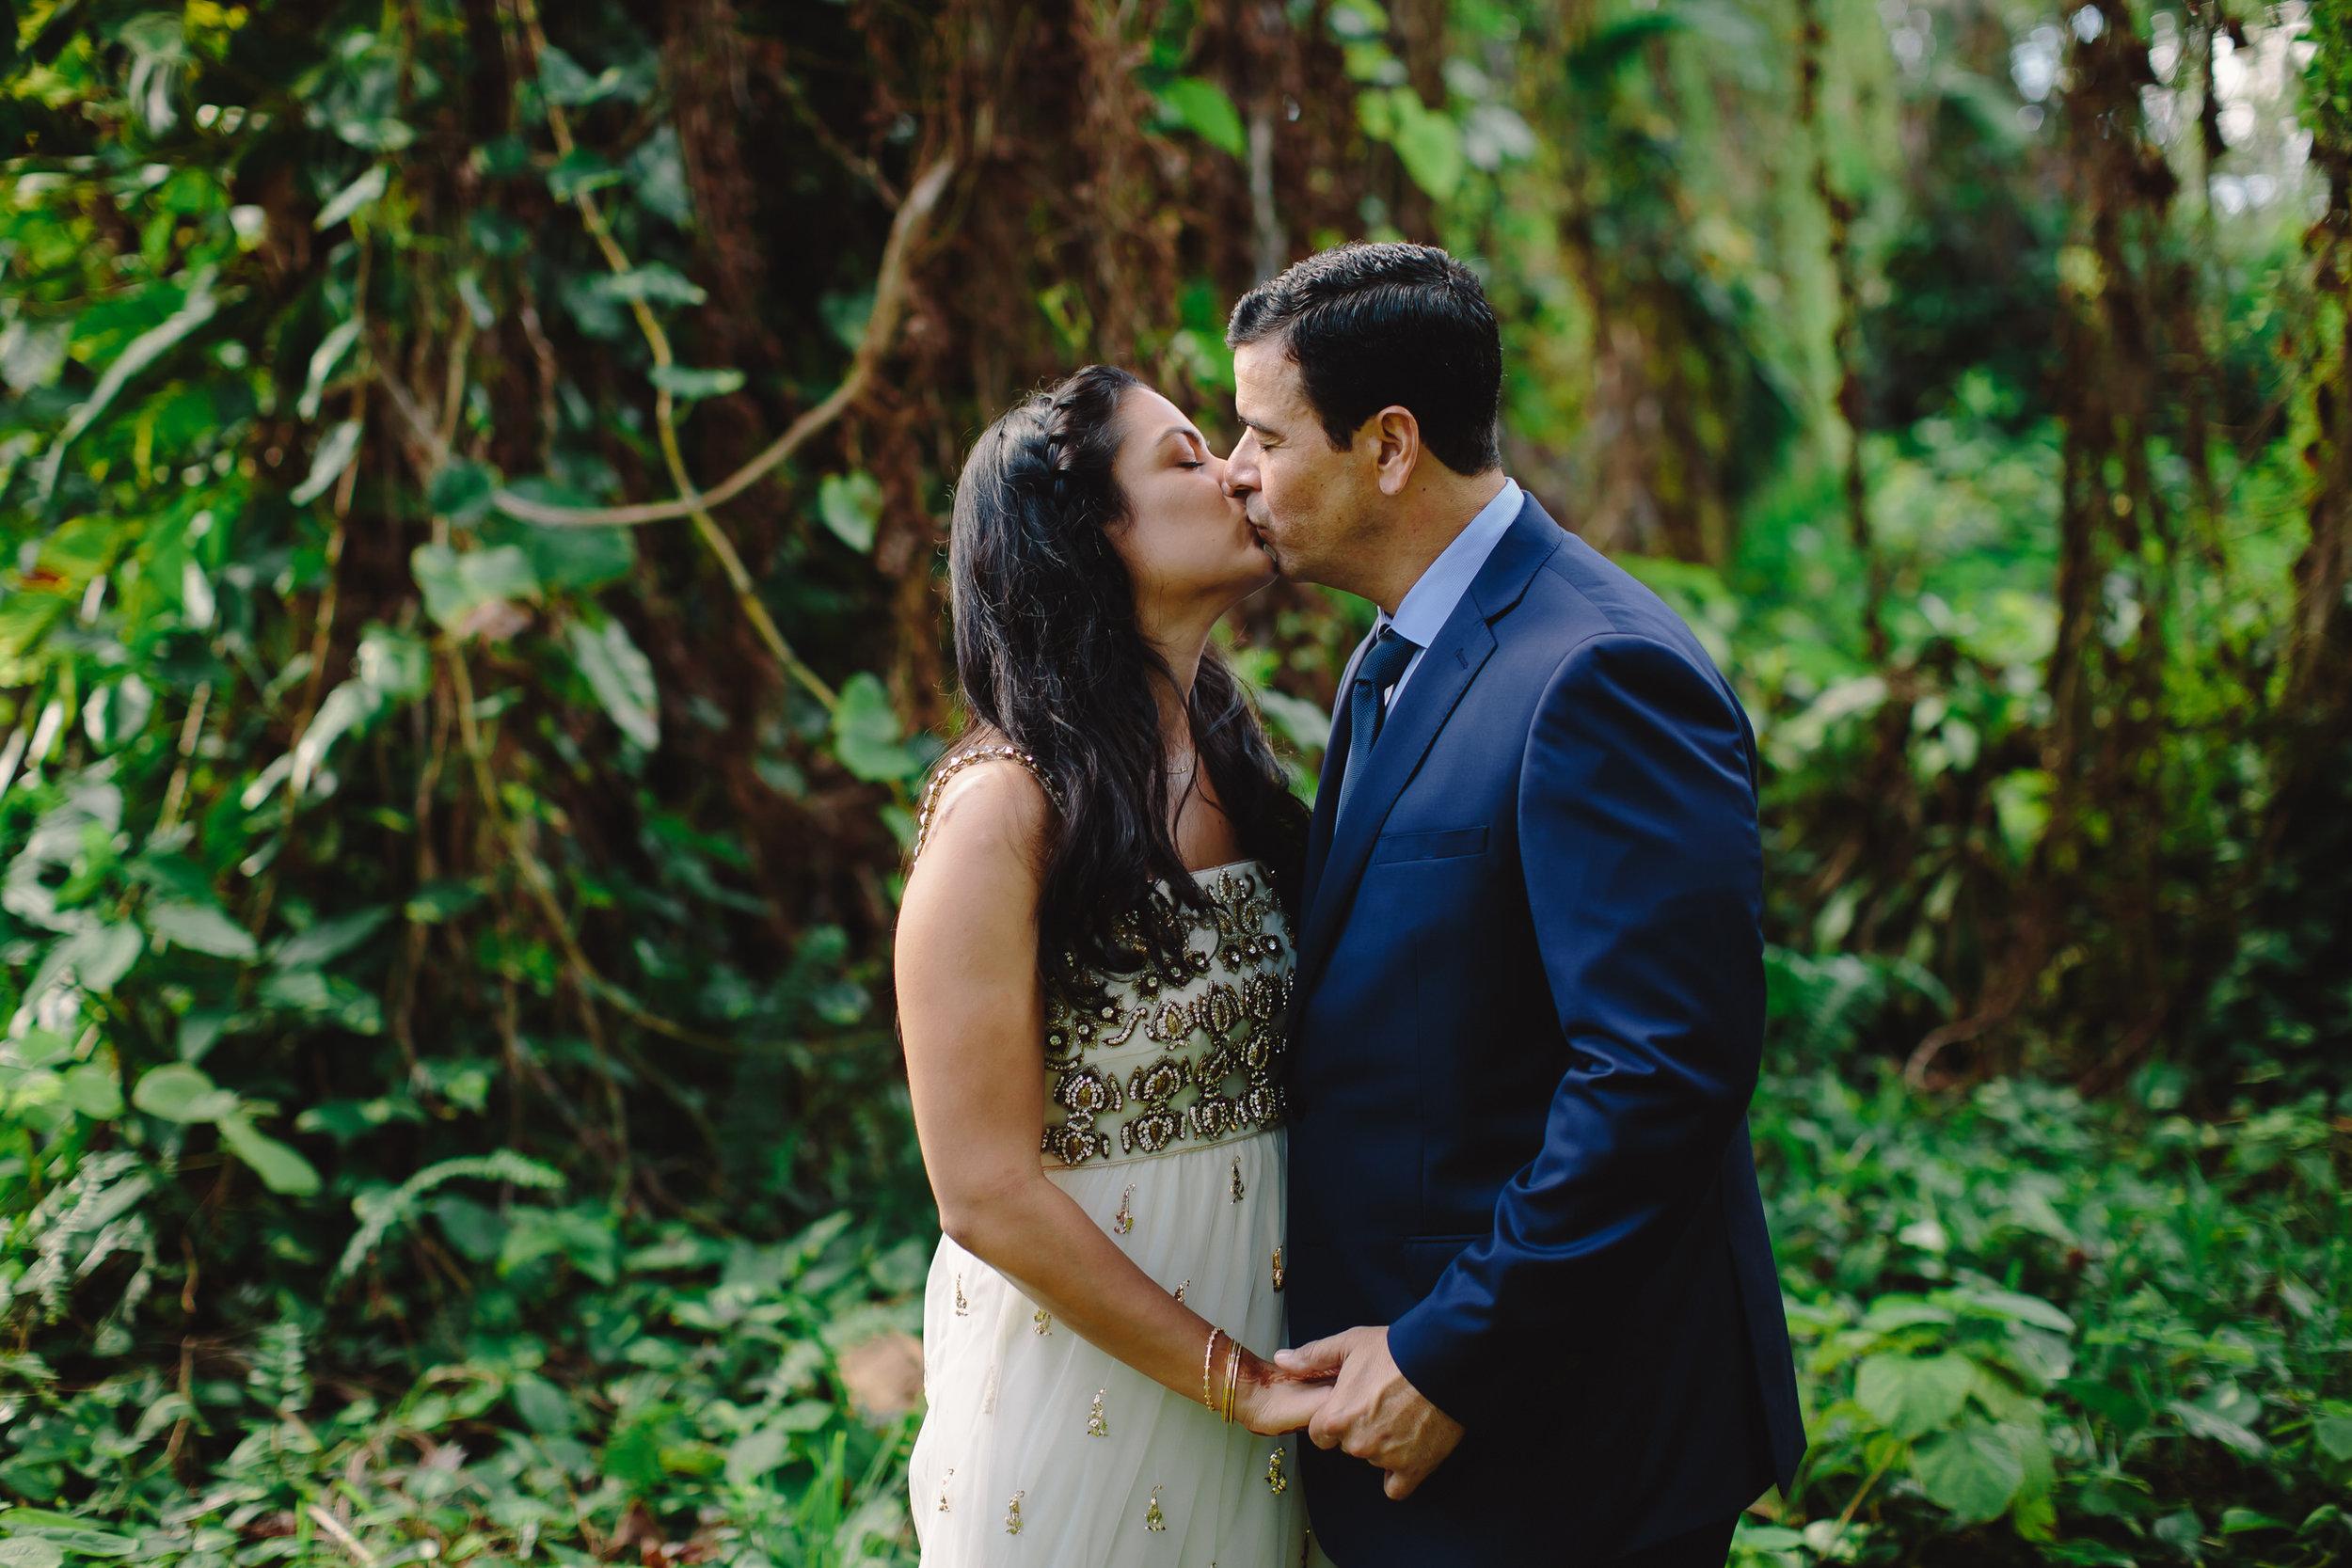 bride-and-groom-kissing-spanish-monastery-wedding-tiny-house-photo.jpg